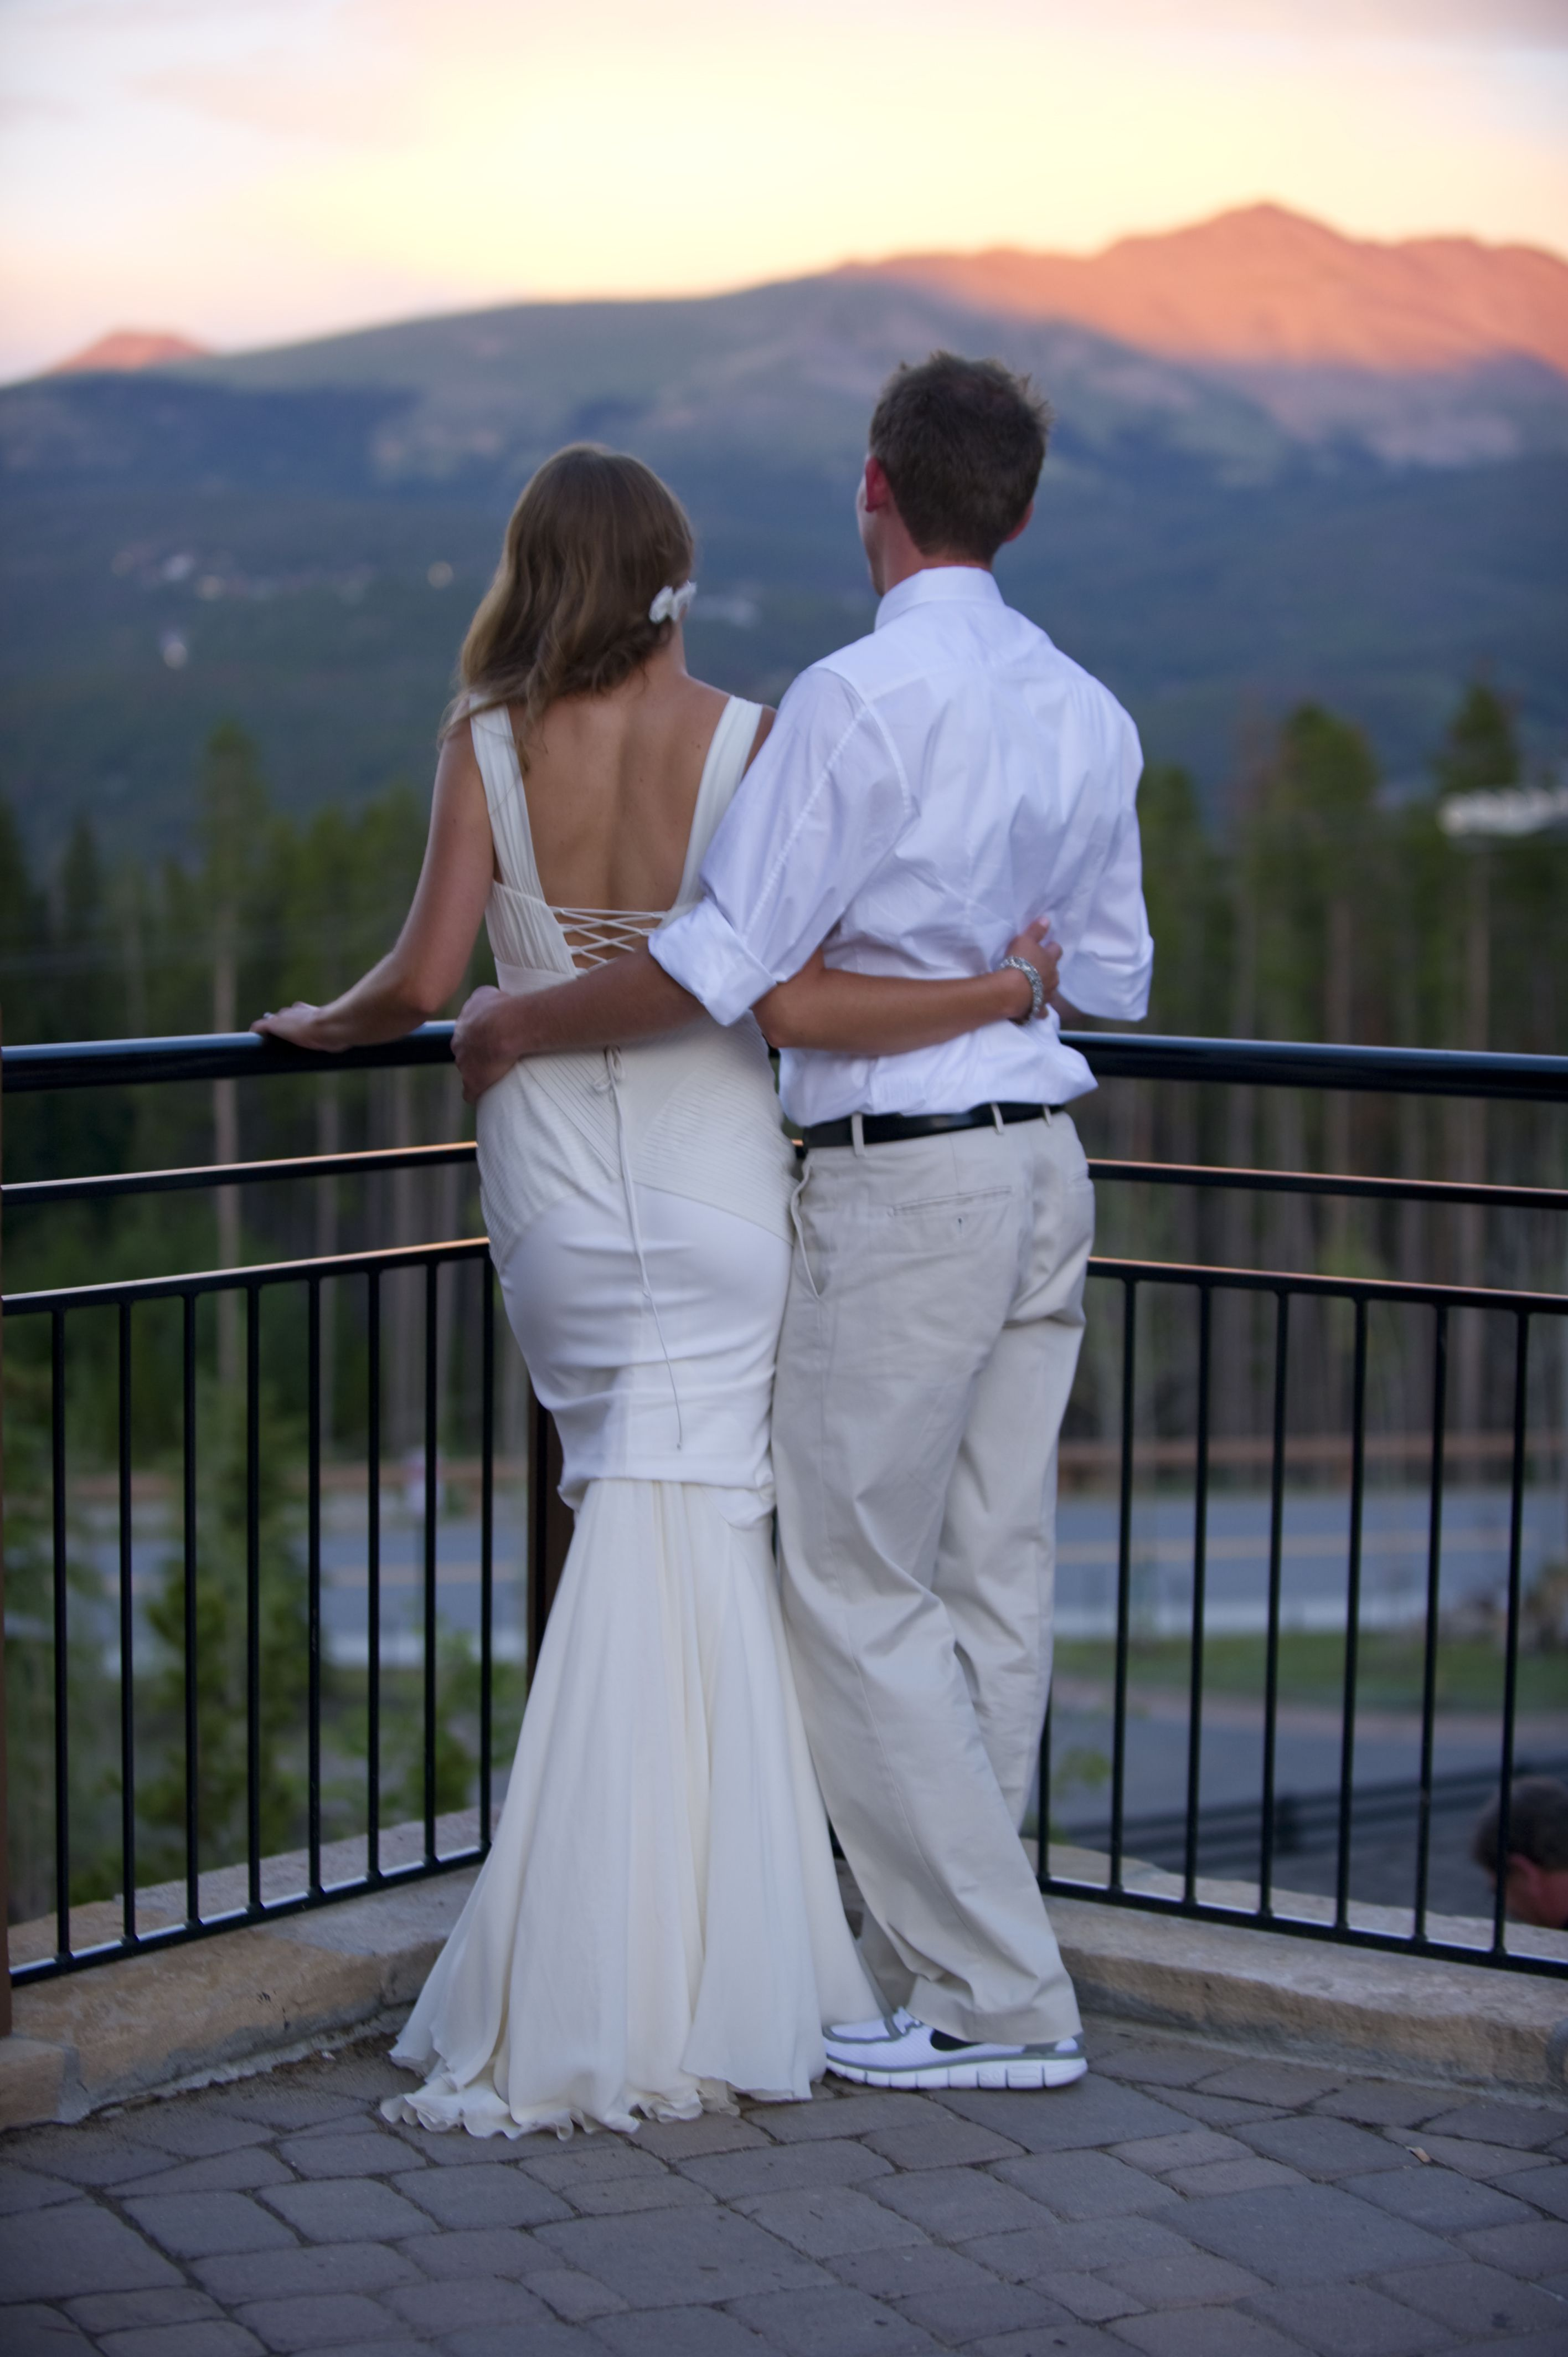 Patio view at Sevens, a wedding venue in Breckenridge